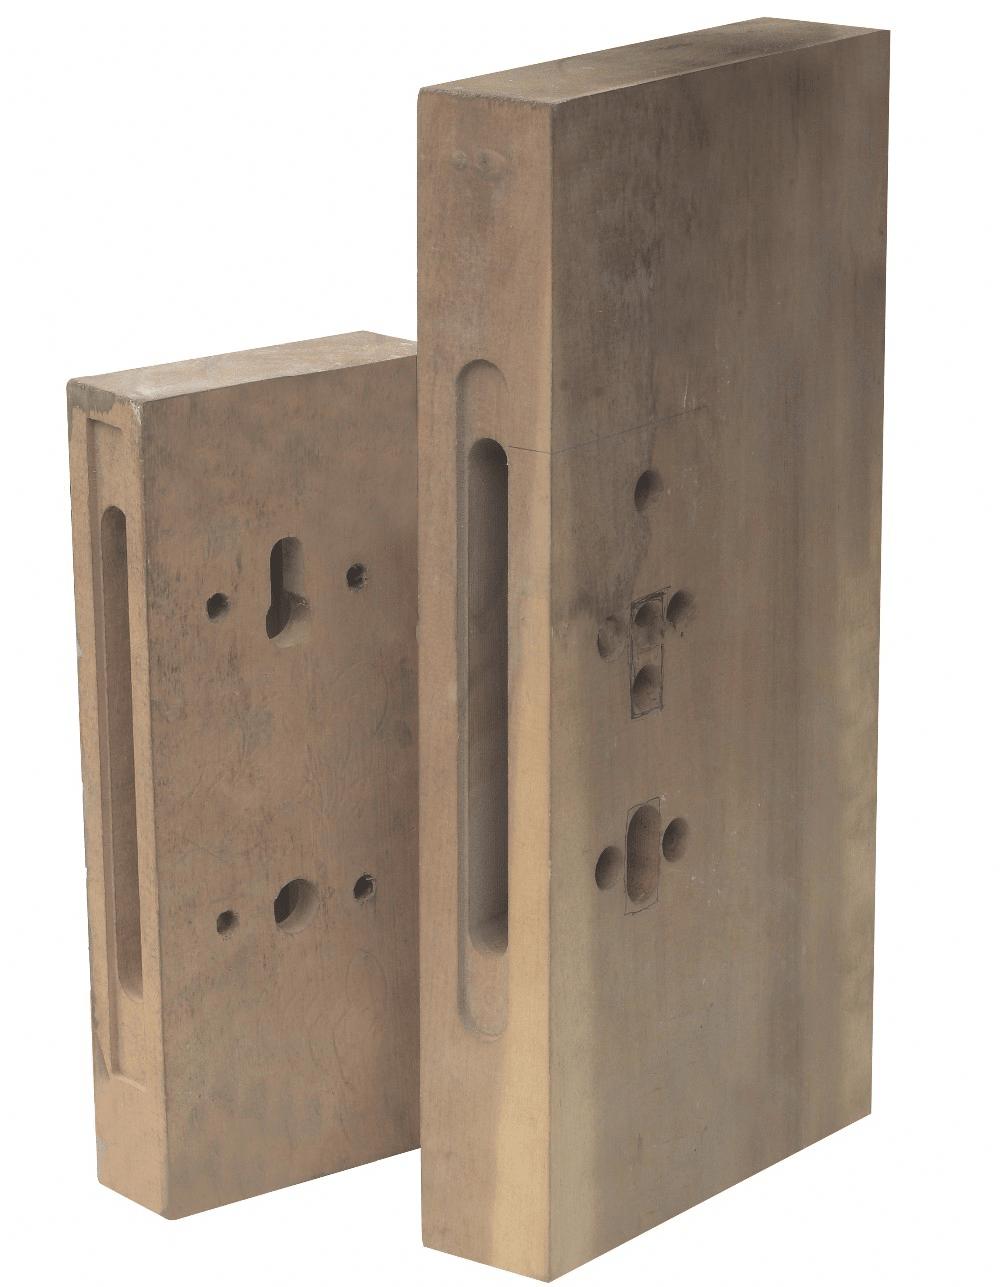 Gewinn wood boring machine hole door mortising machine